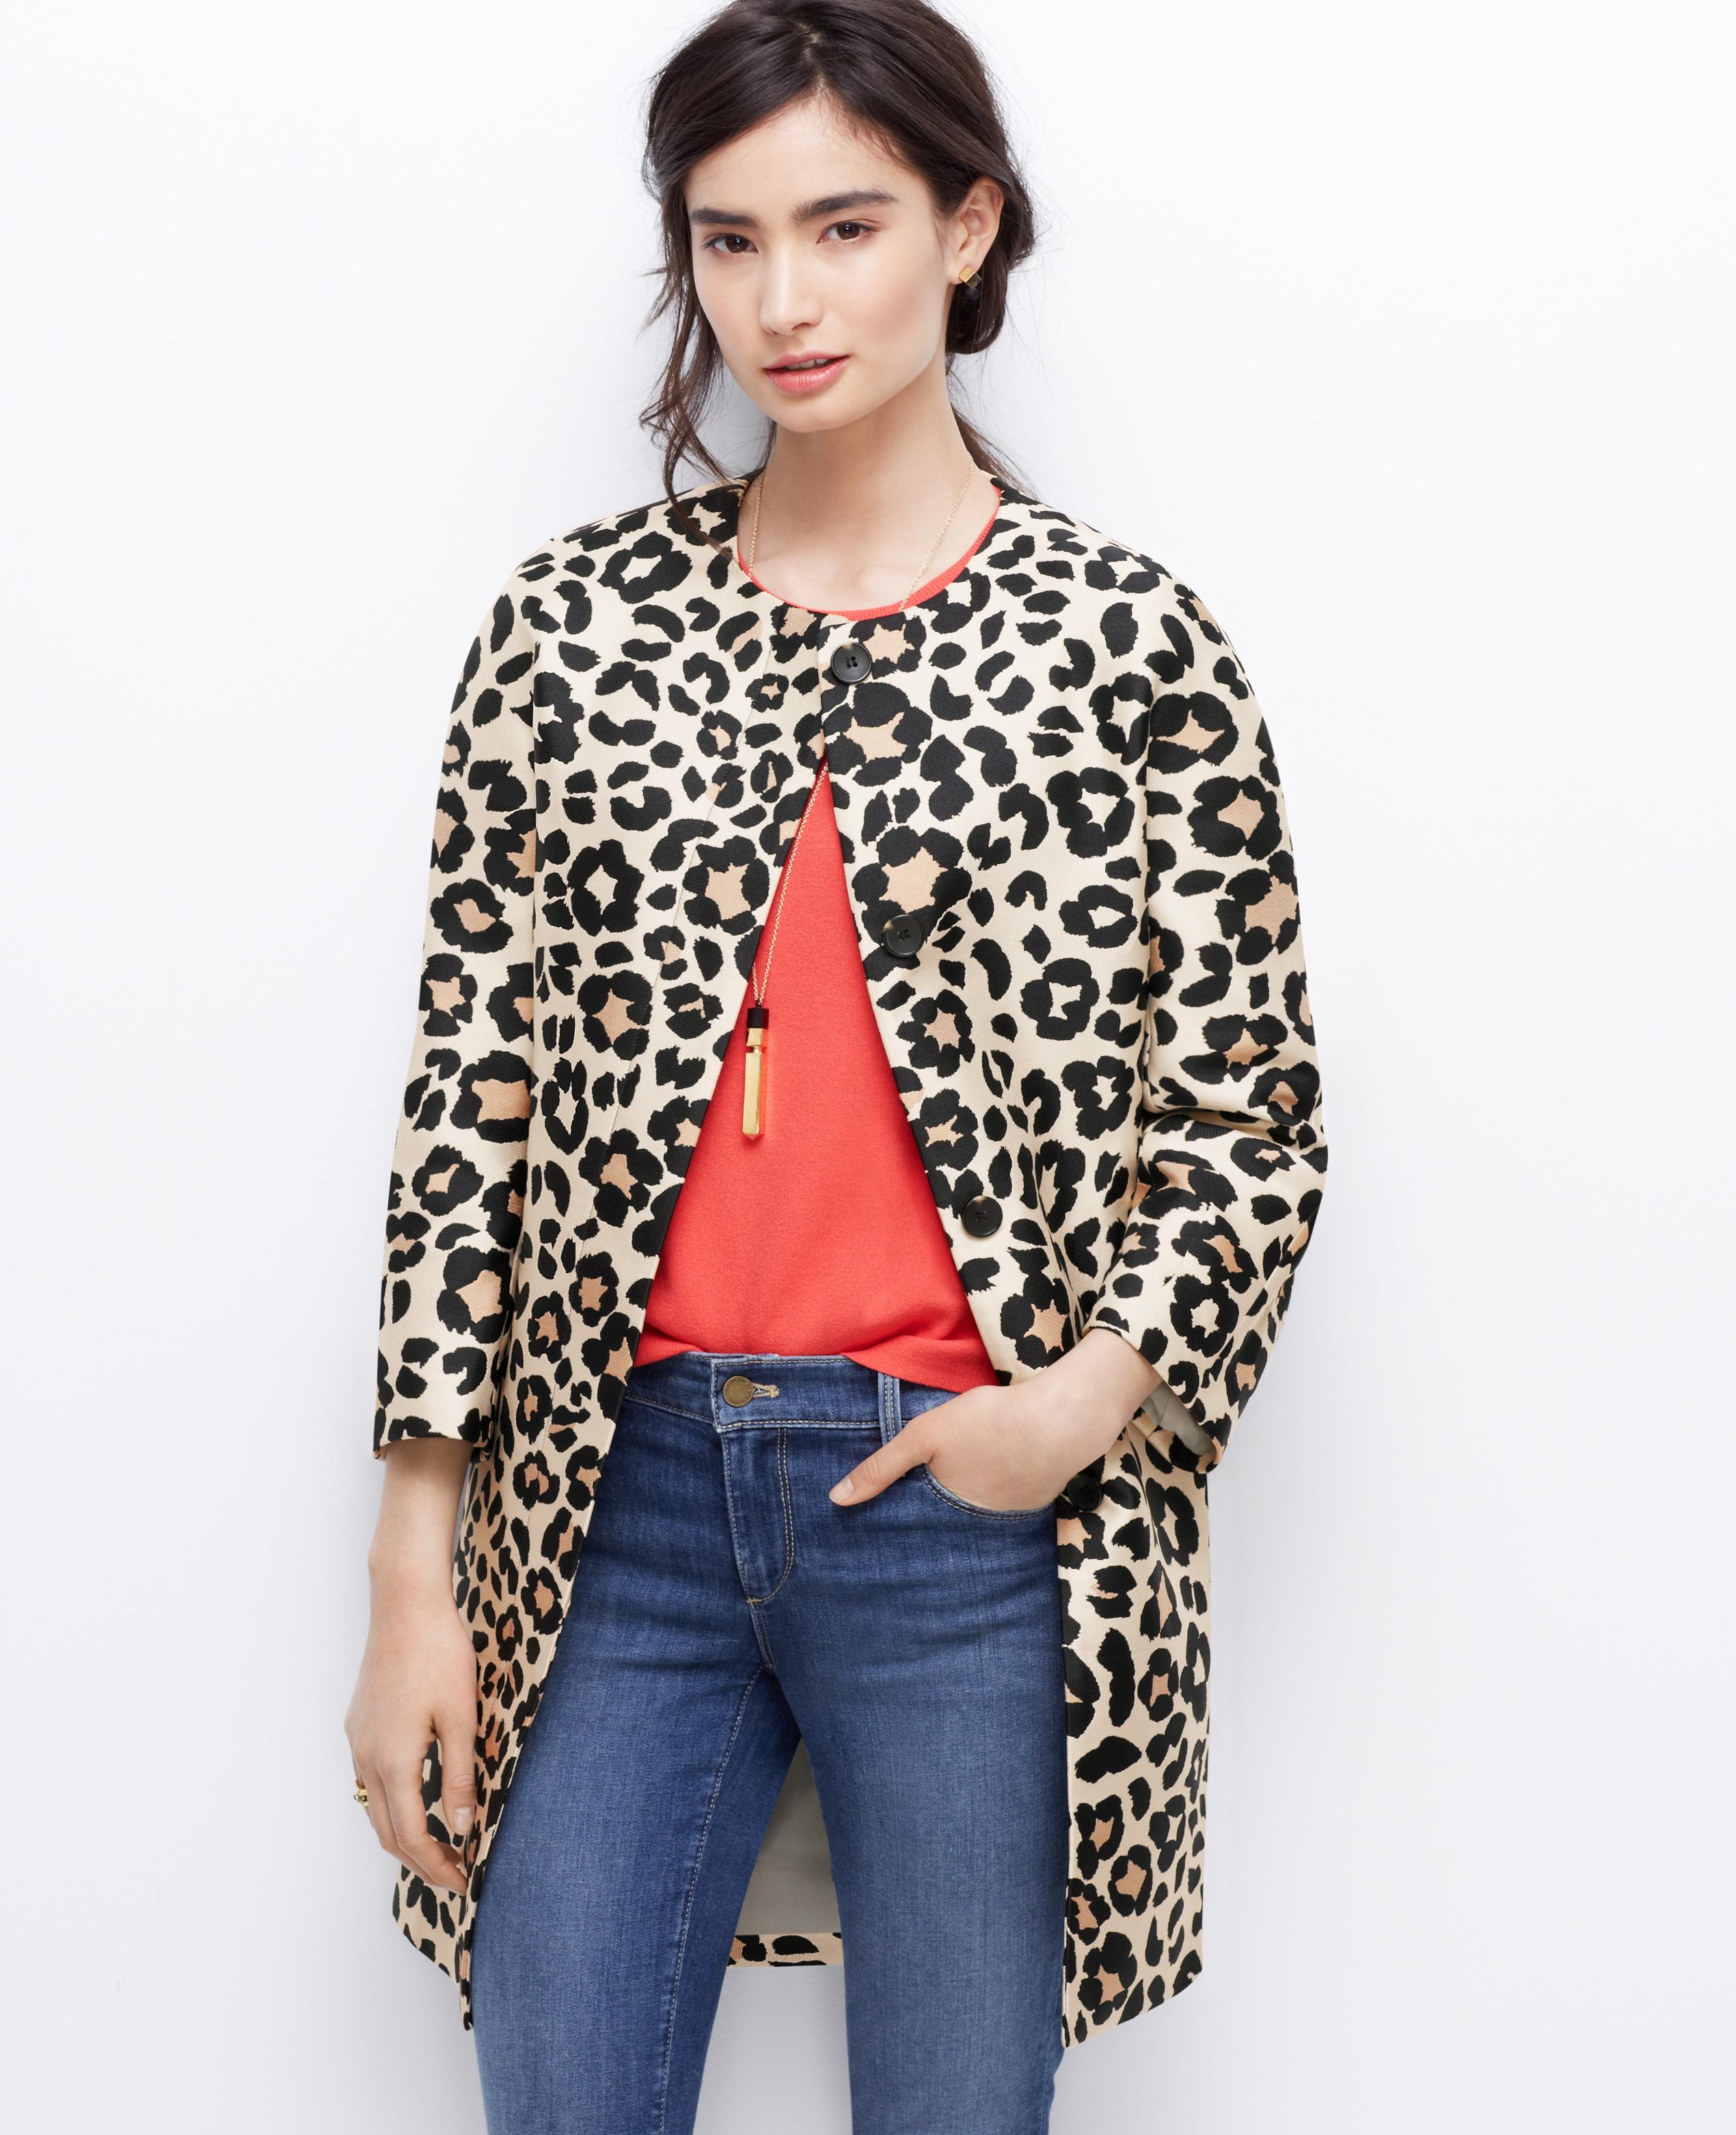 79a2c53920bf Ann Taylor Petite Spring Leopard Coat - Lyst